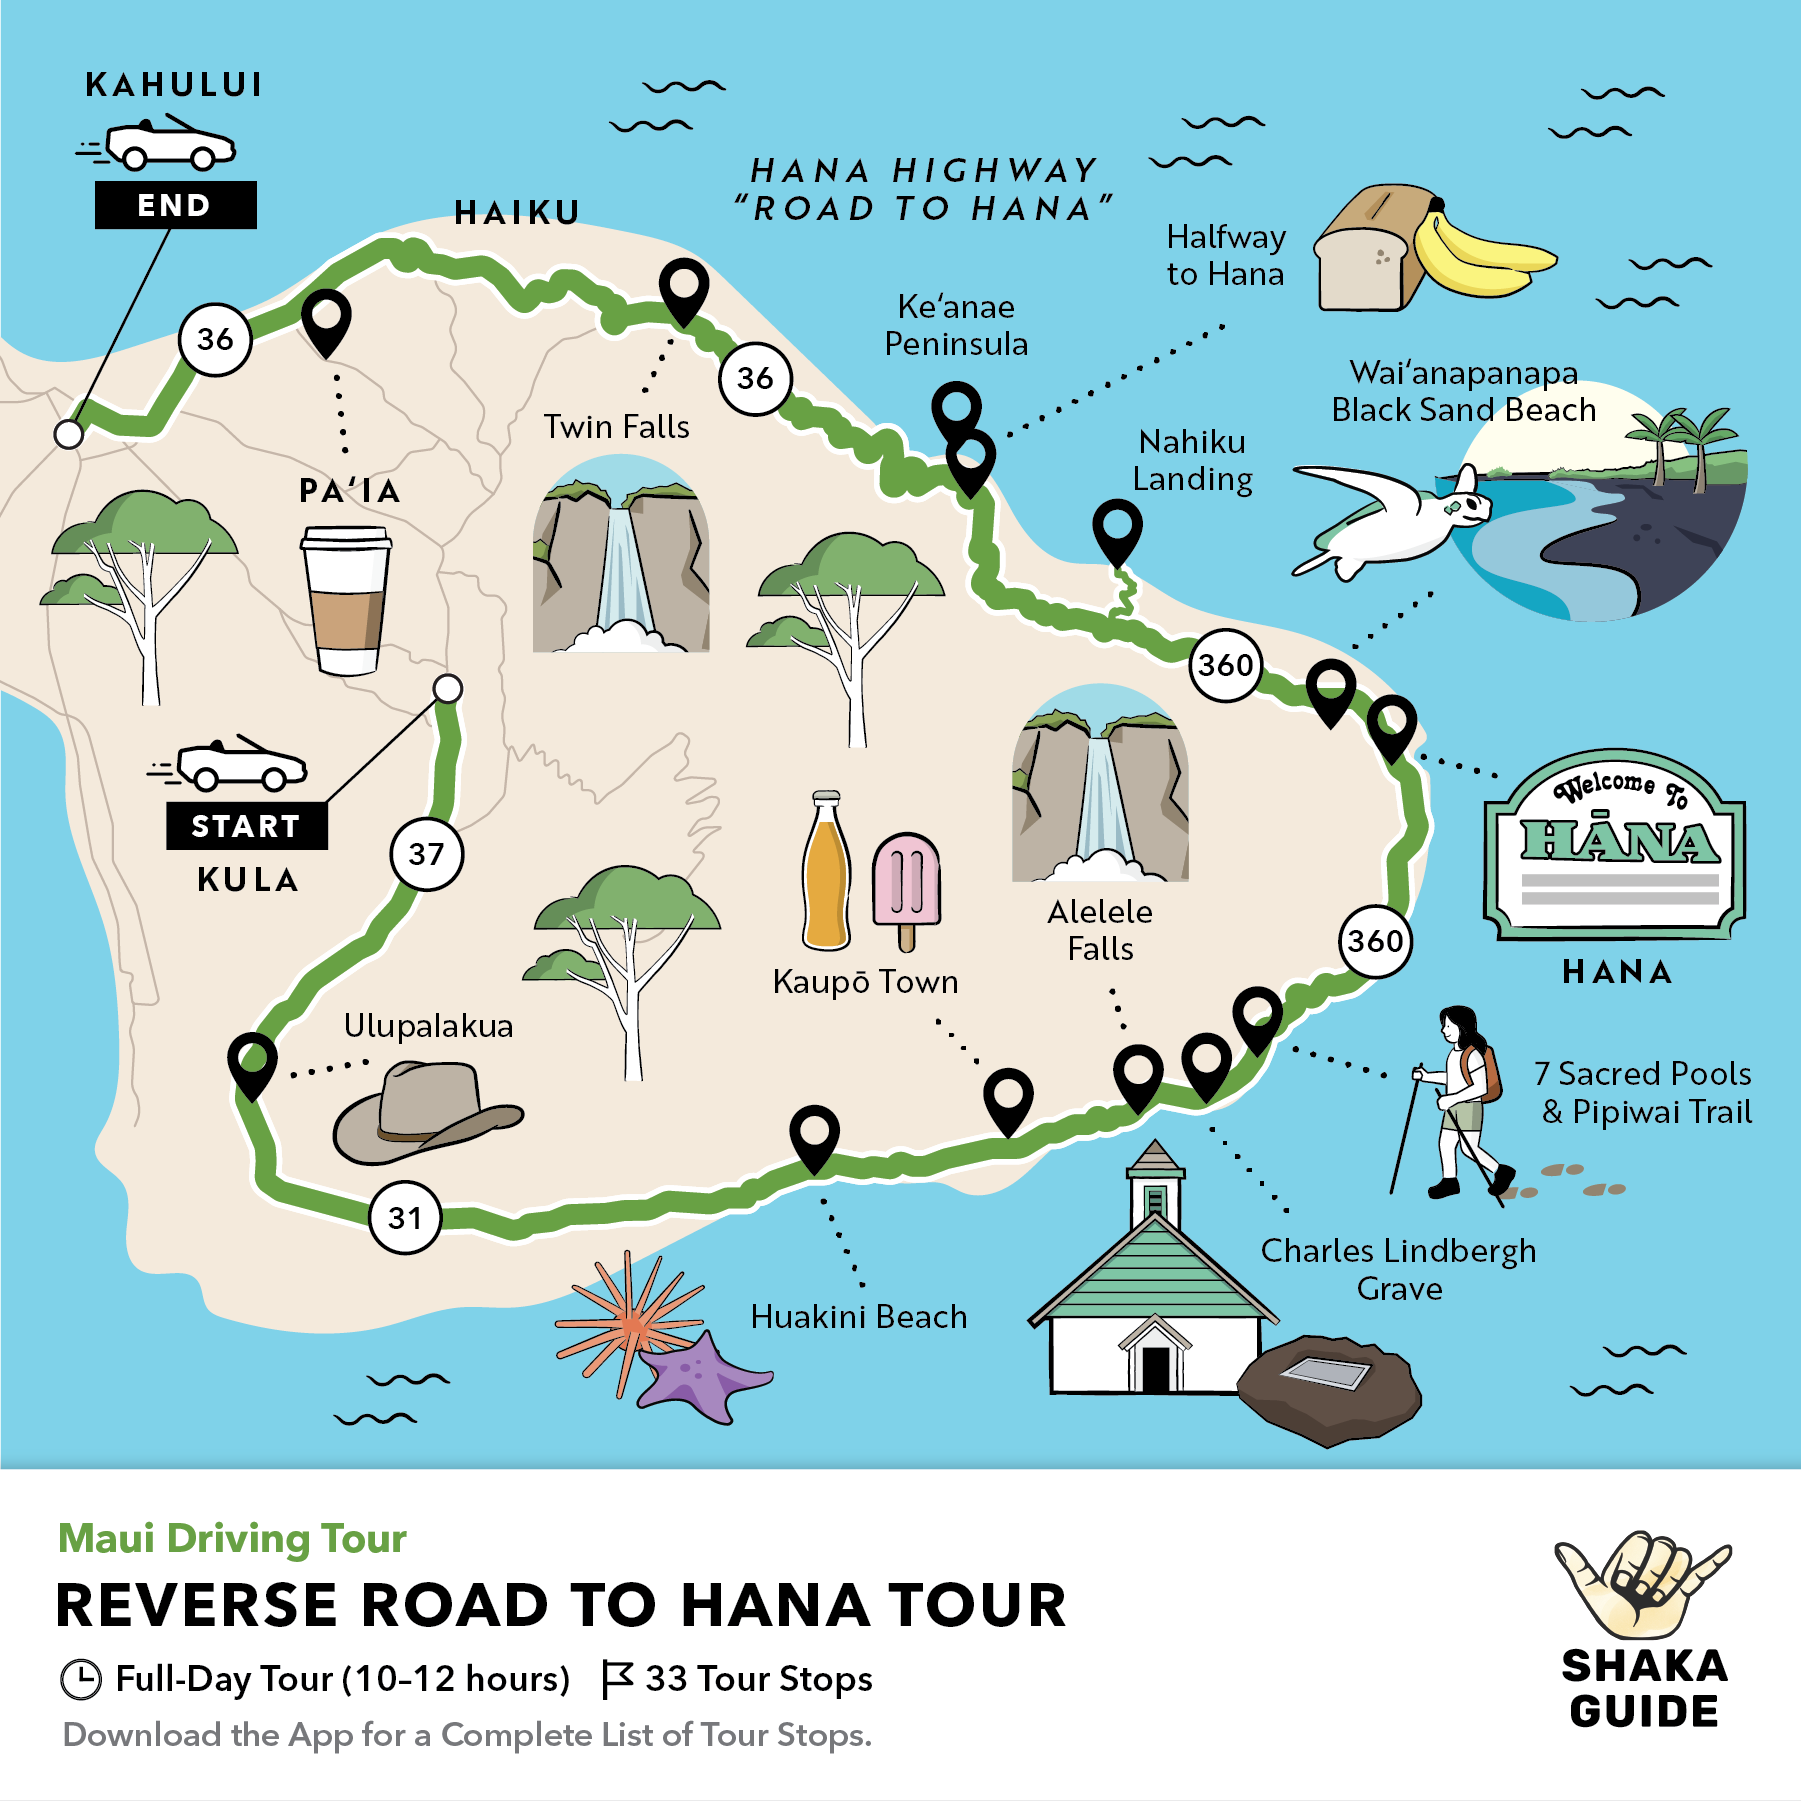 Shaka Guide's Reverse Road to Hana